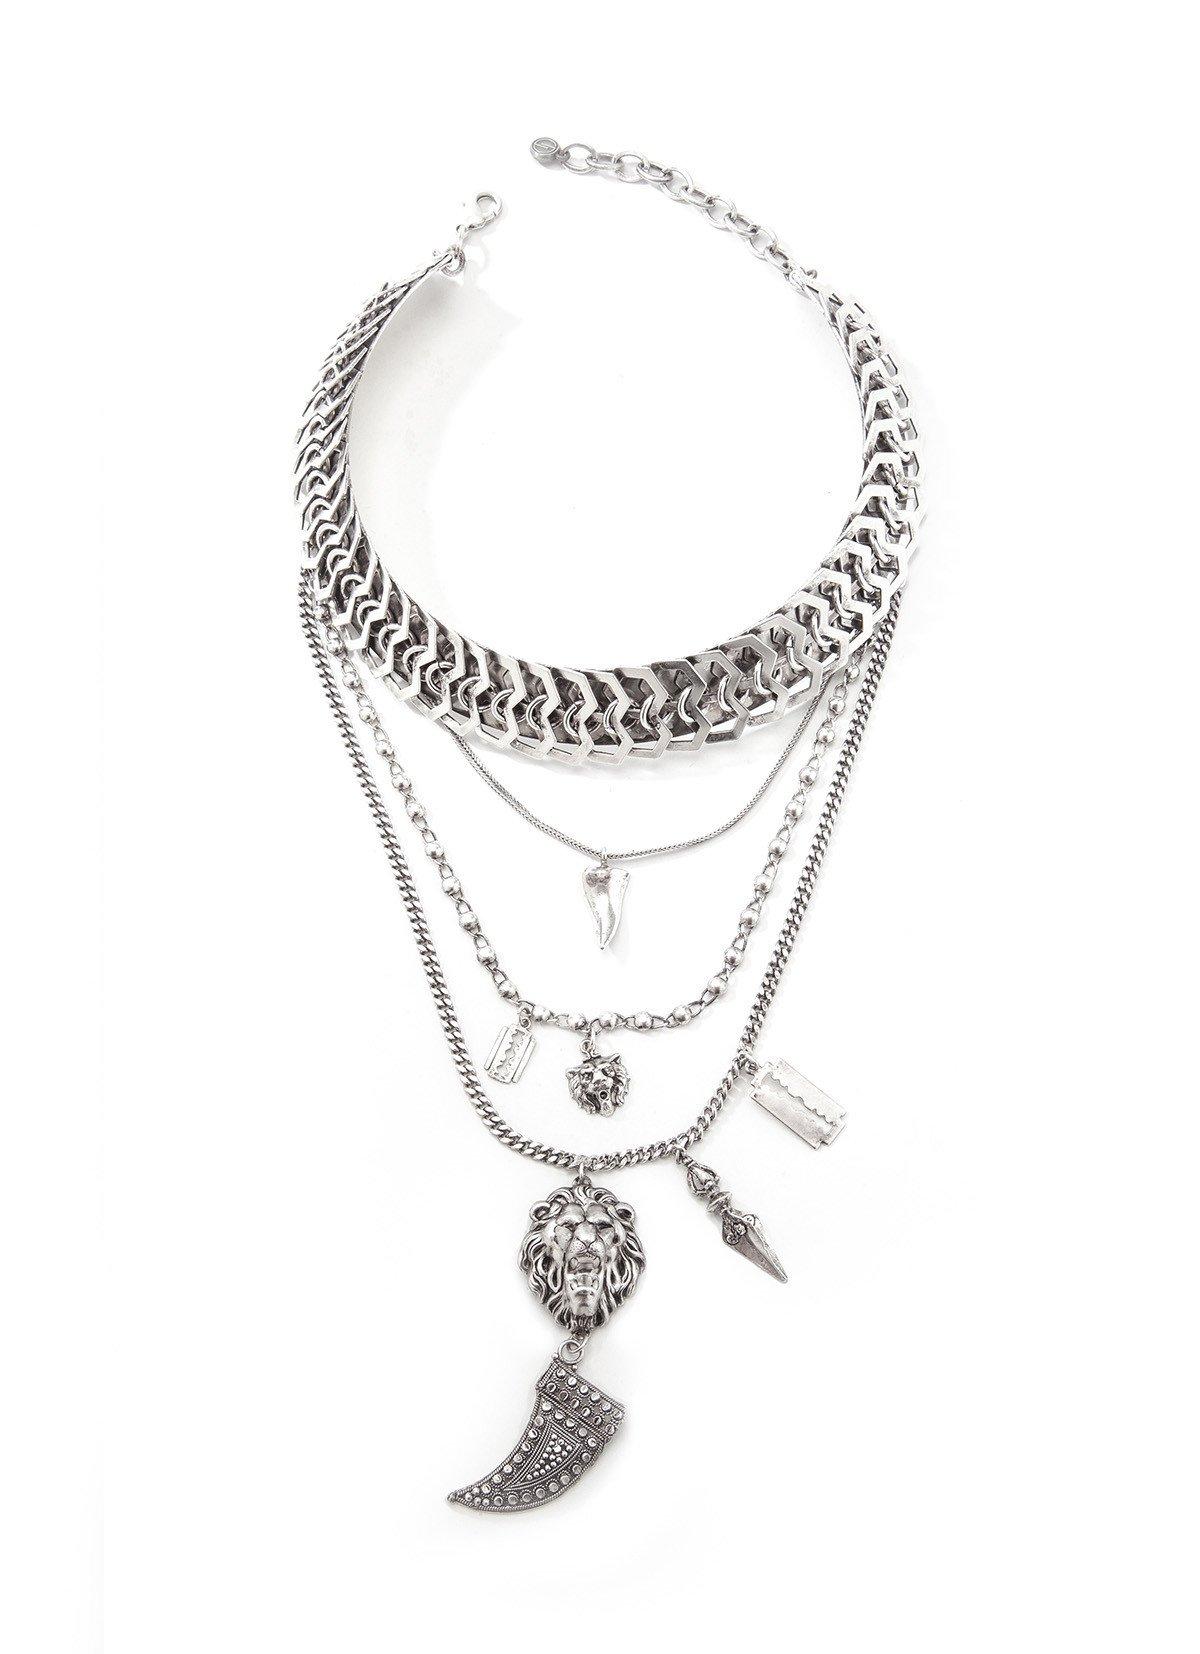 Main_0015_necklace_1.jpg